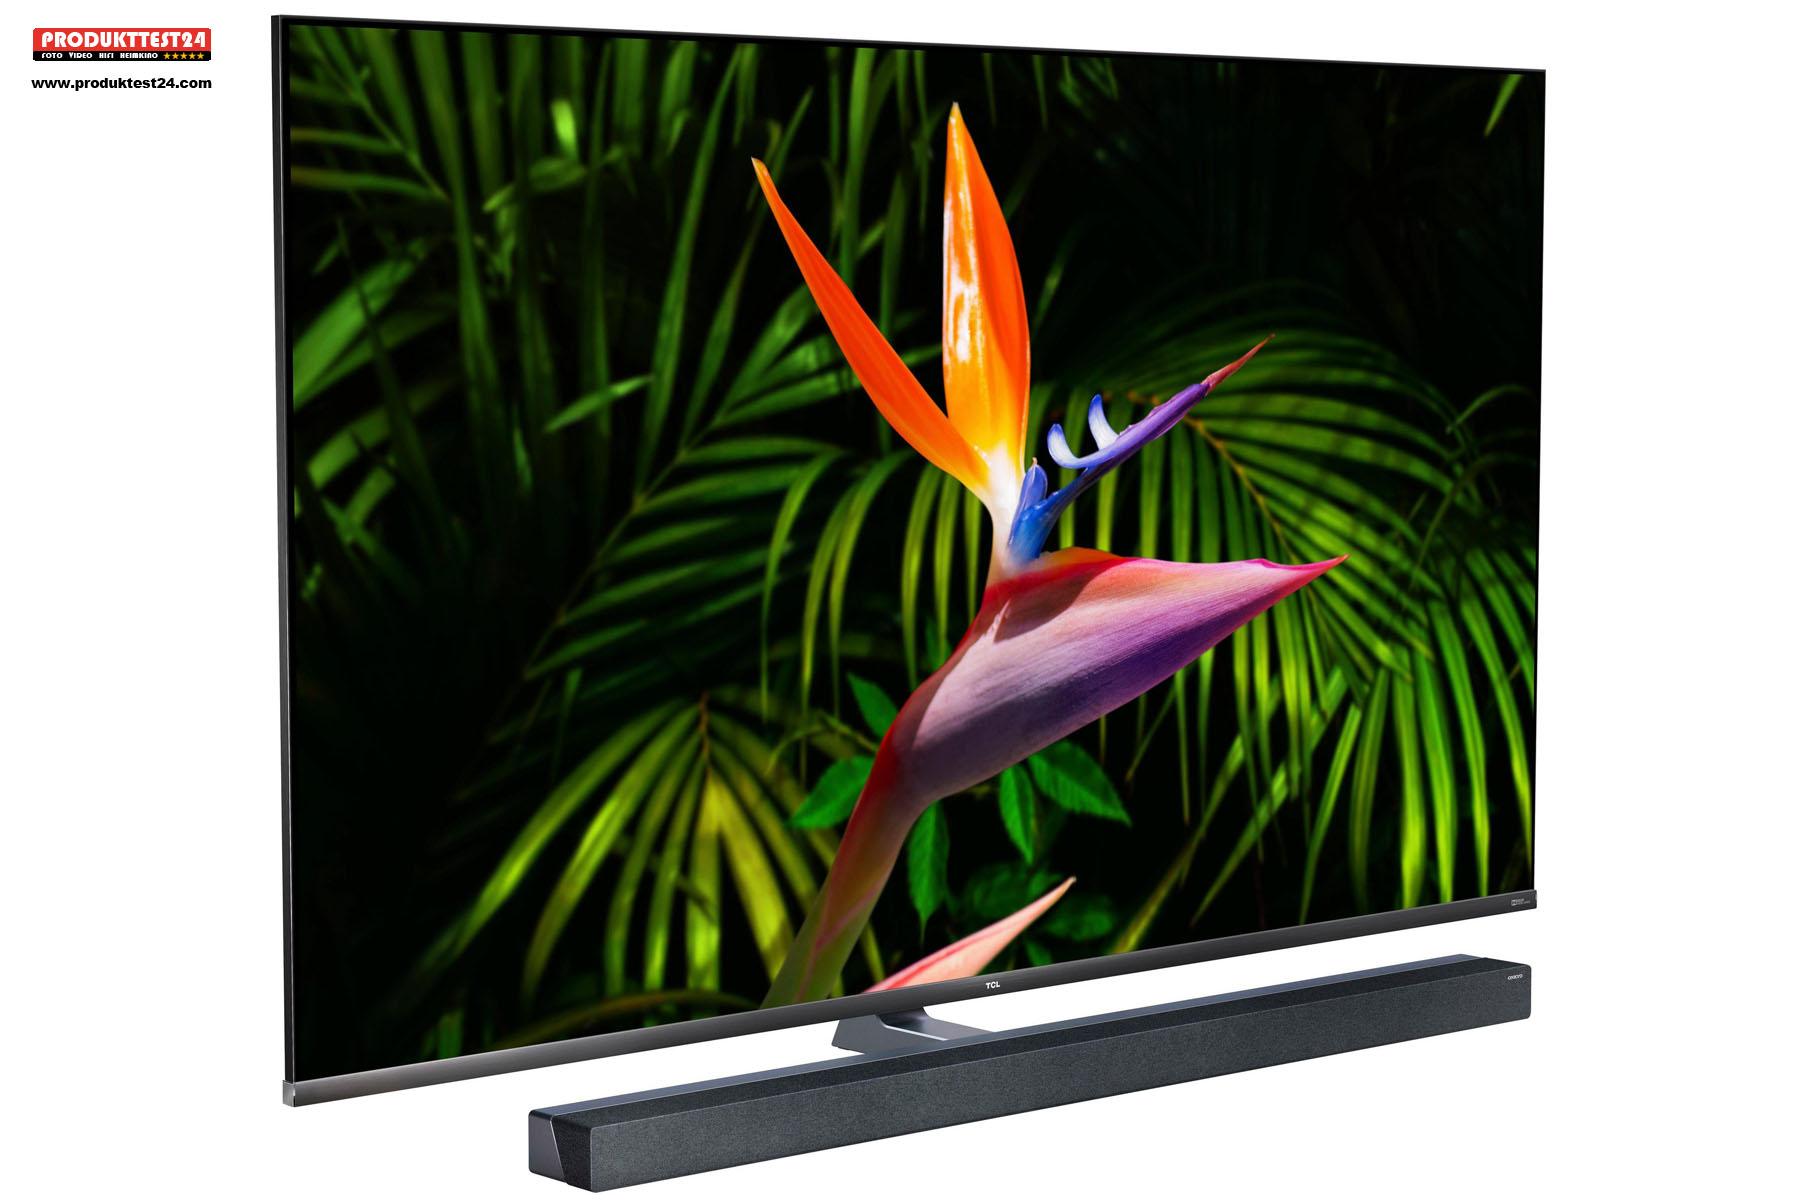 Der TCL 65X10 Mini-LED QLED 4K-Fernseher